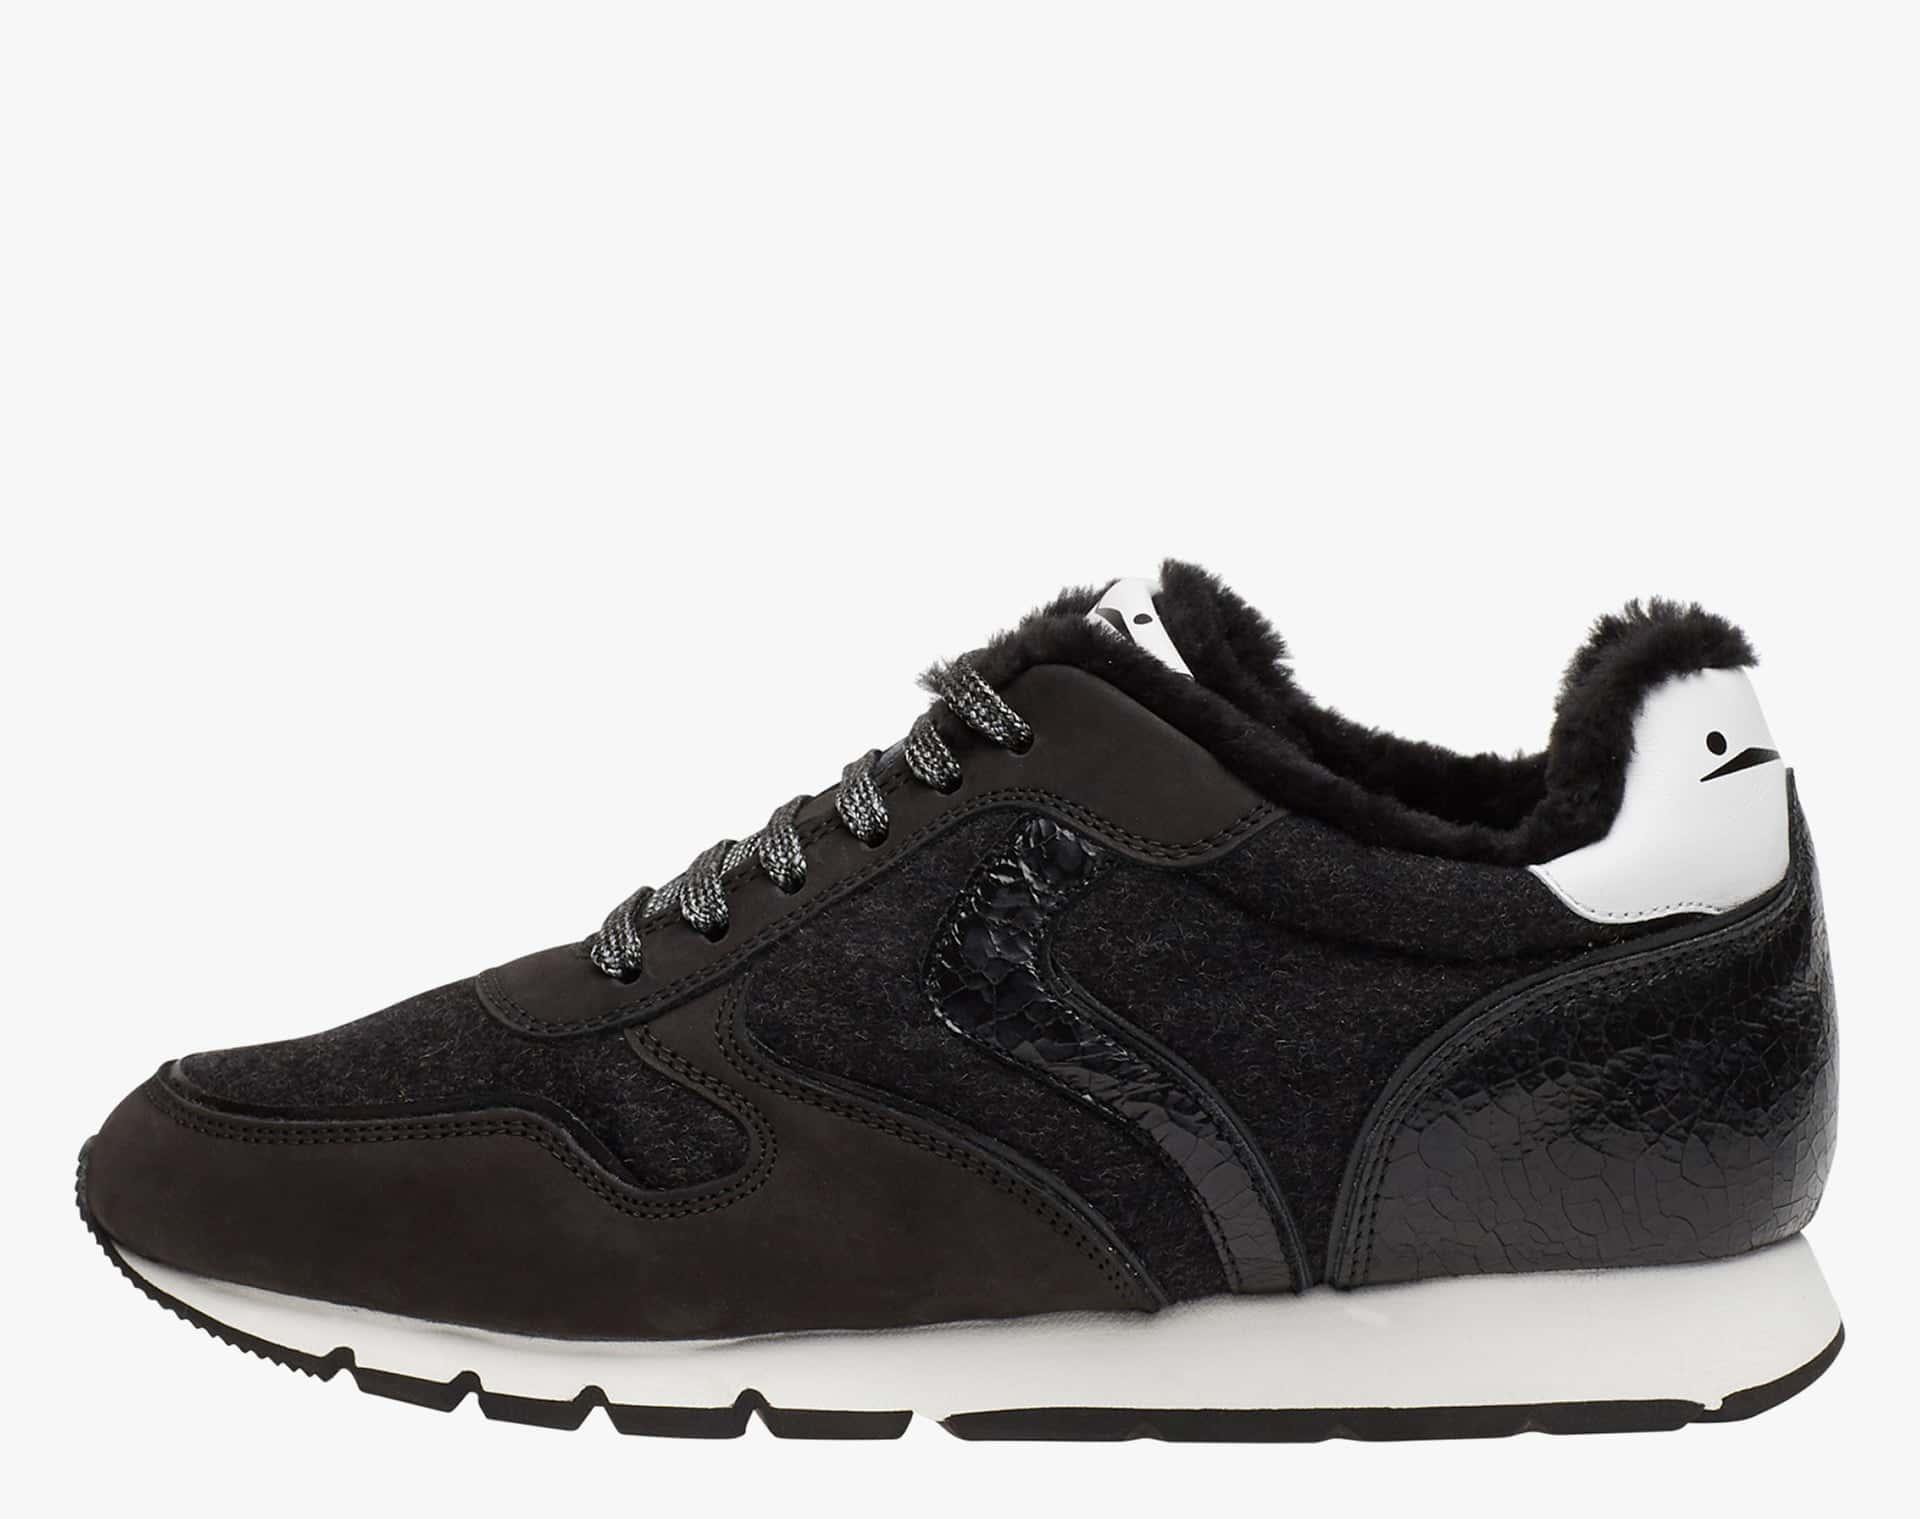 JULIA FUR - Nubuck sneakers - BLACK-WHITE